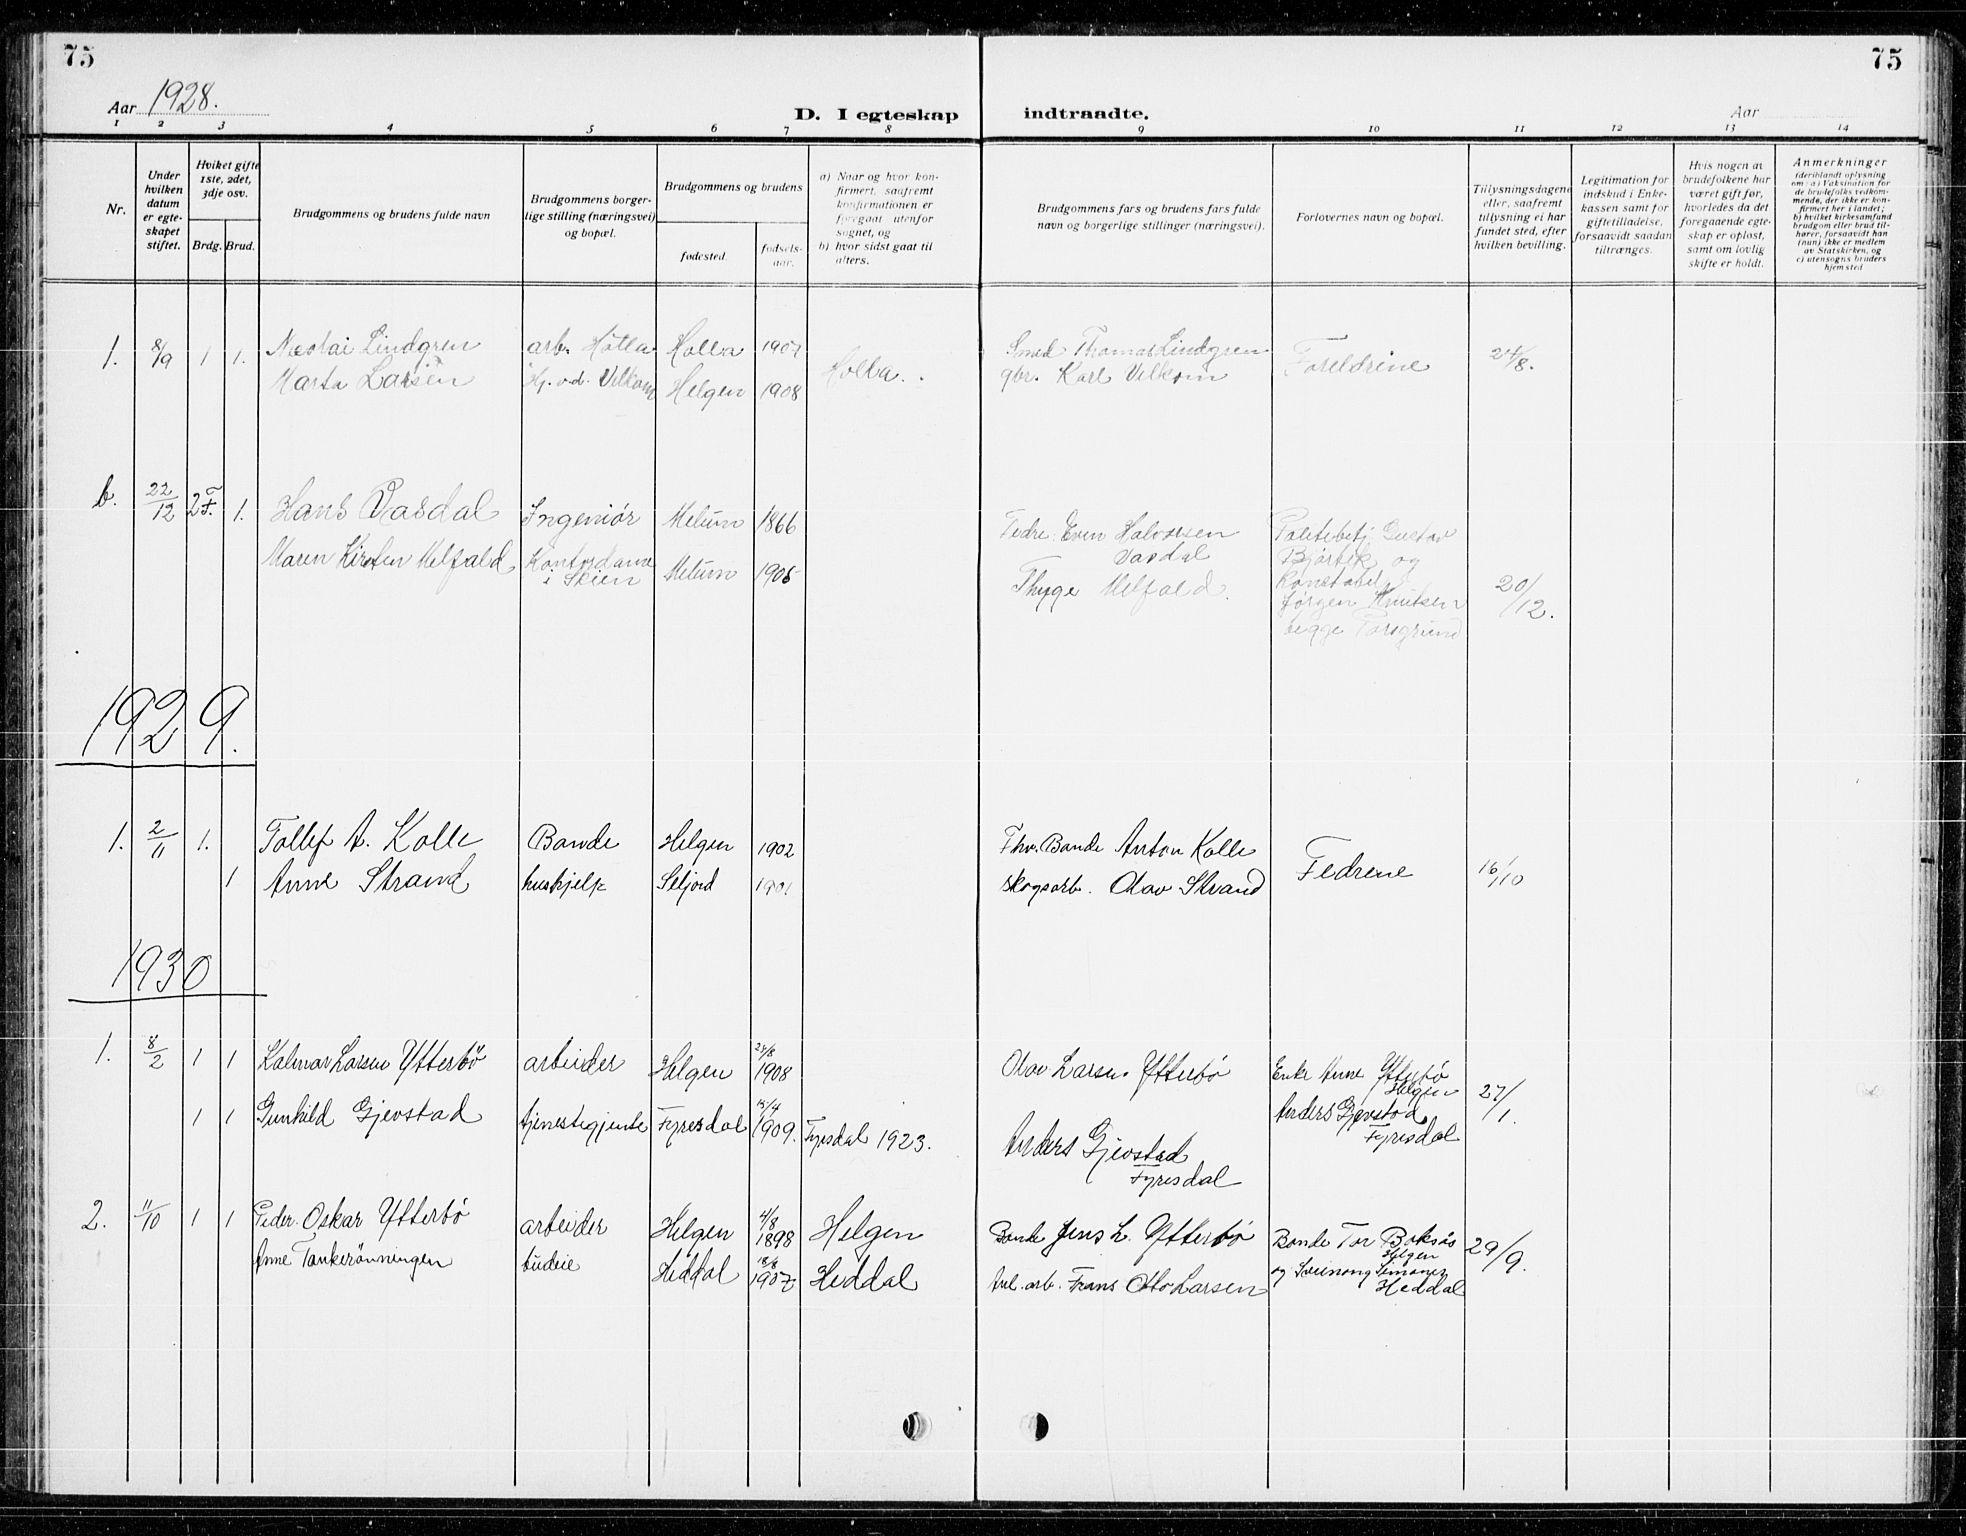 SAKO, Holla kirkebøker, G/Gb/L0003: Klokkerbok nr. II 3, 1914-1941, s. 75